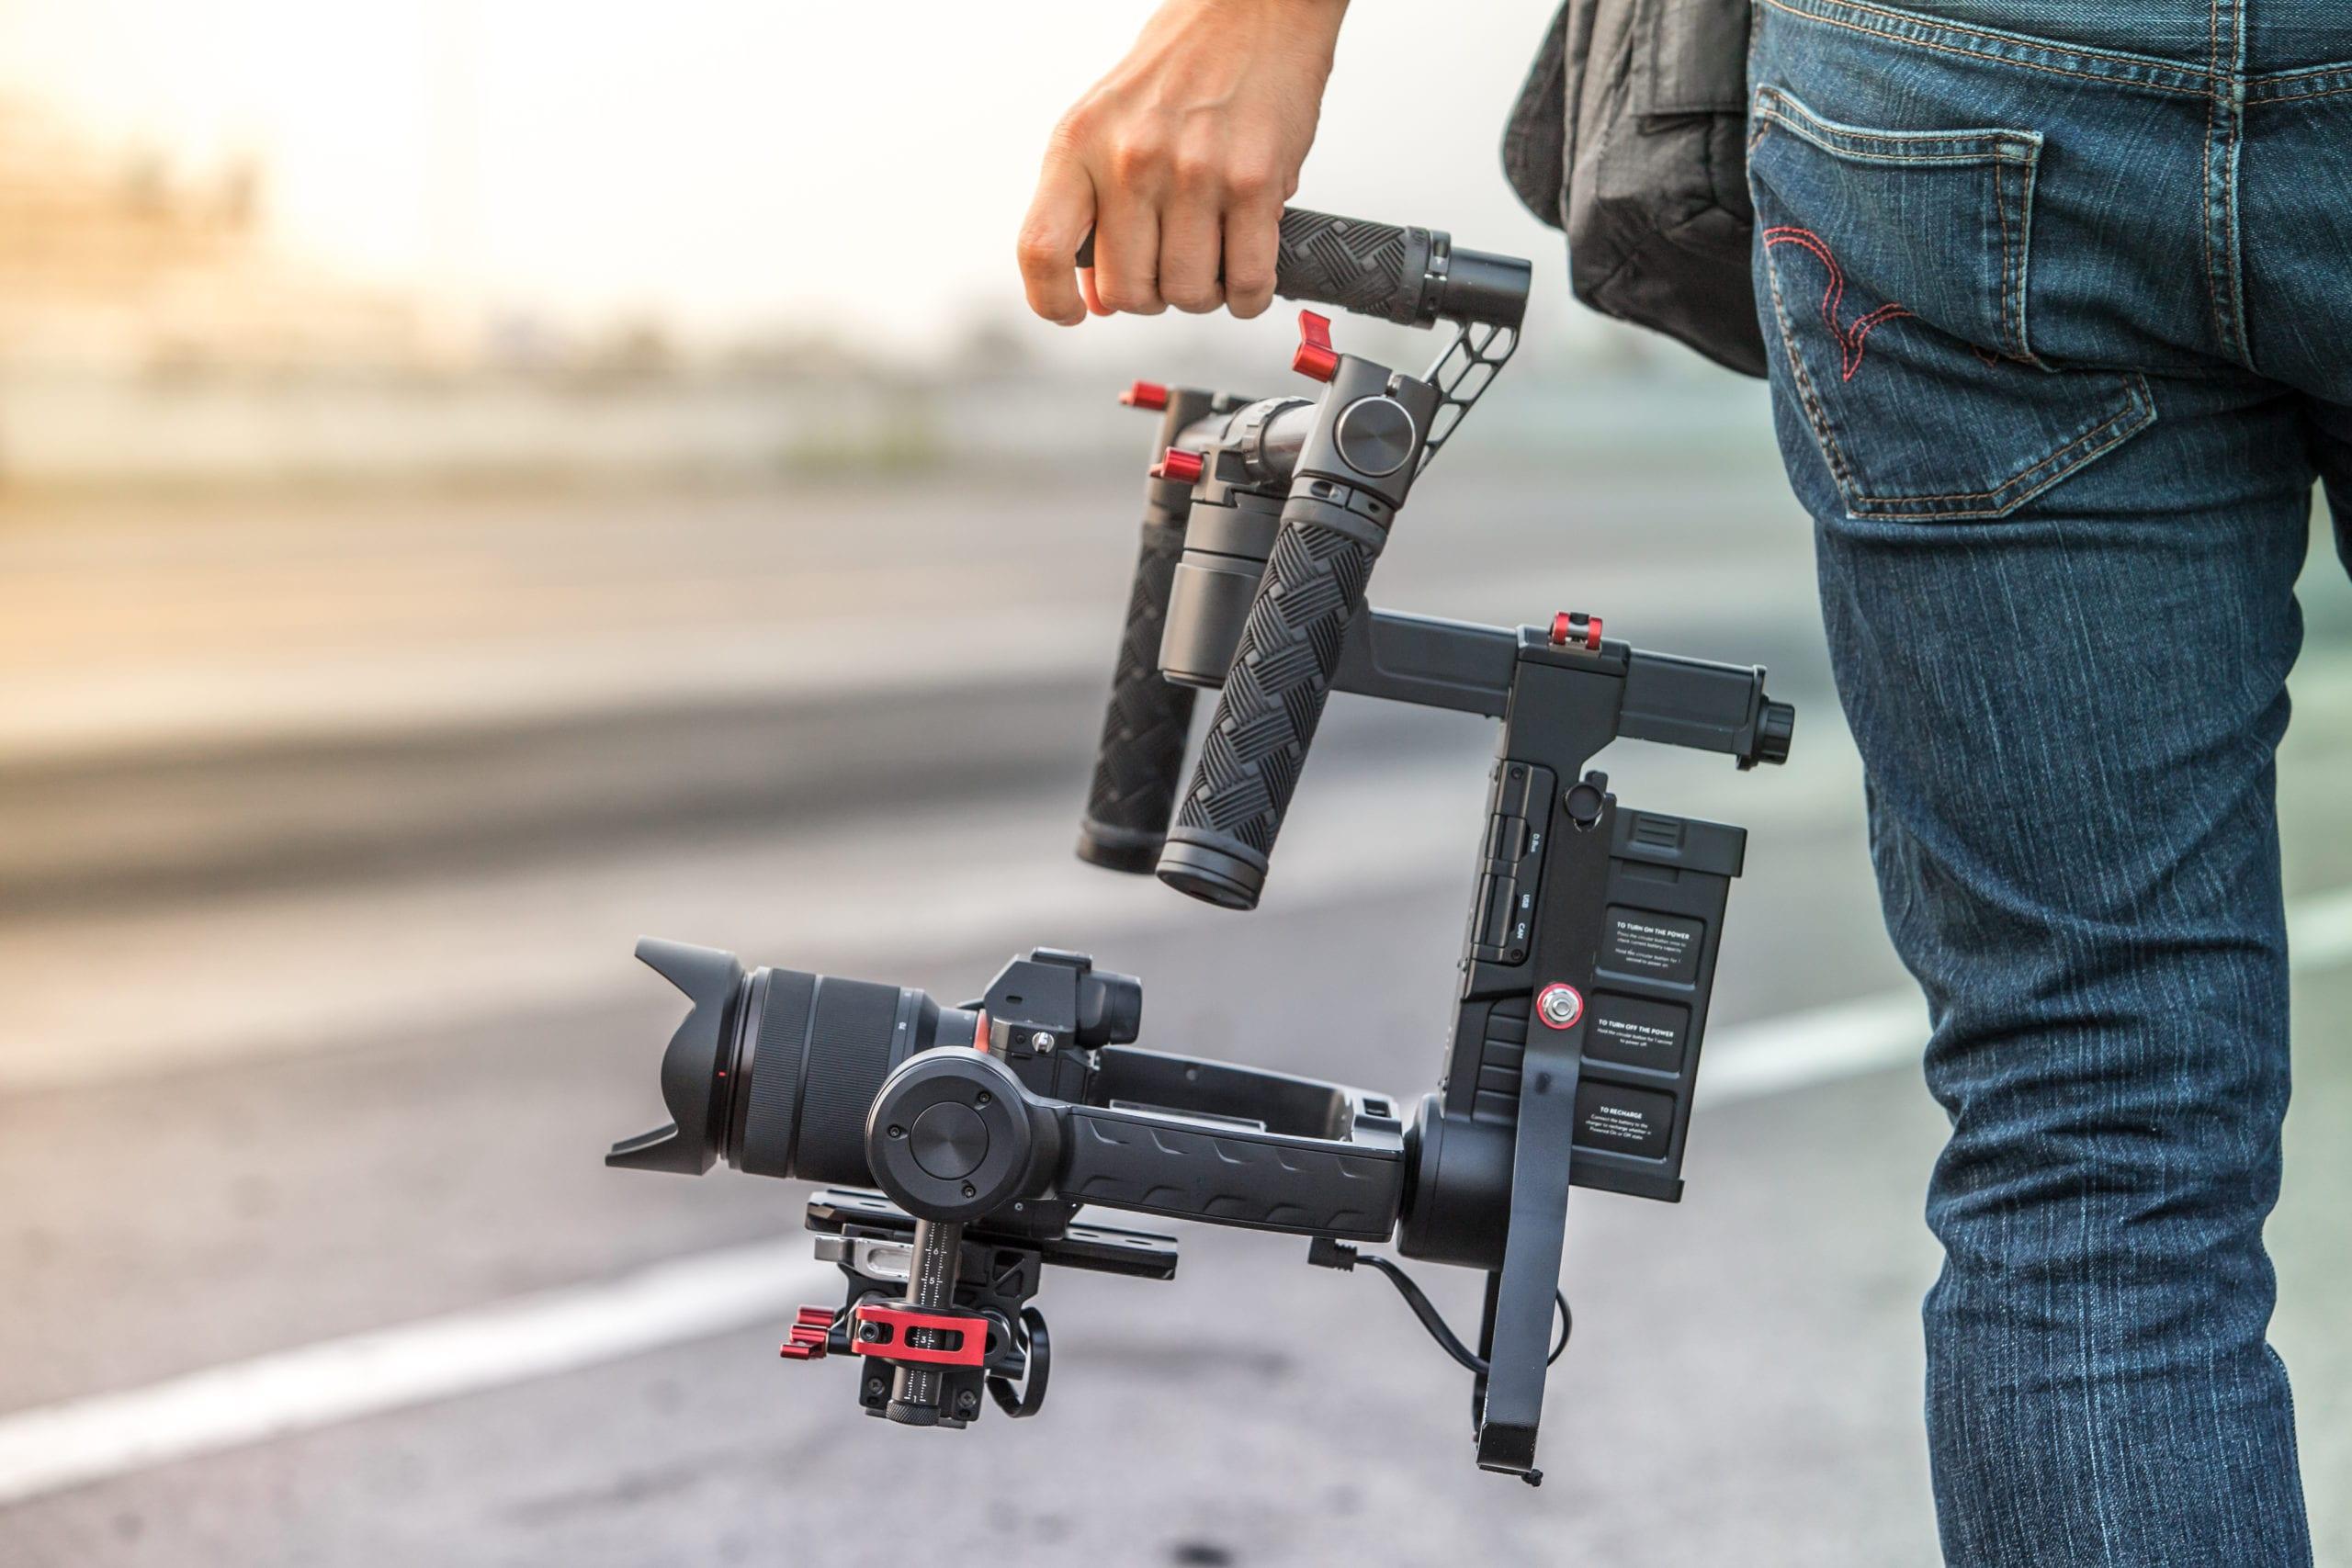 Man holding video equipment